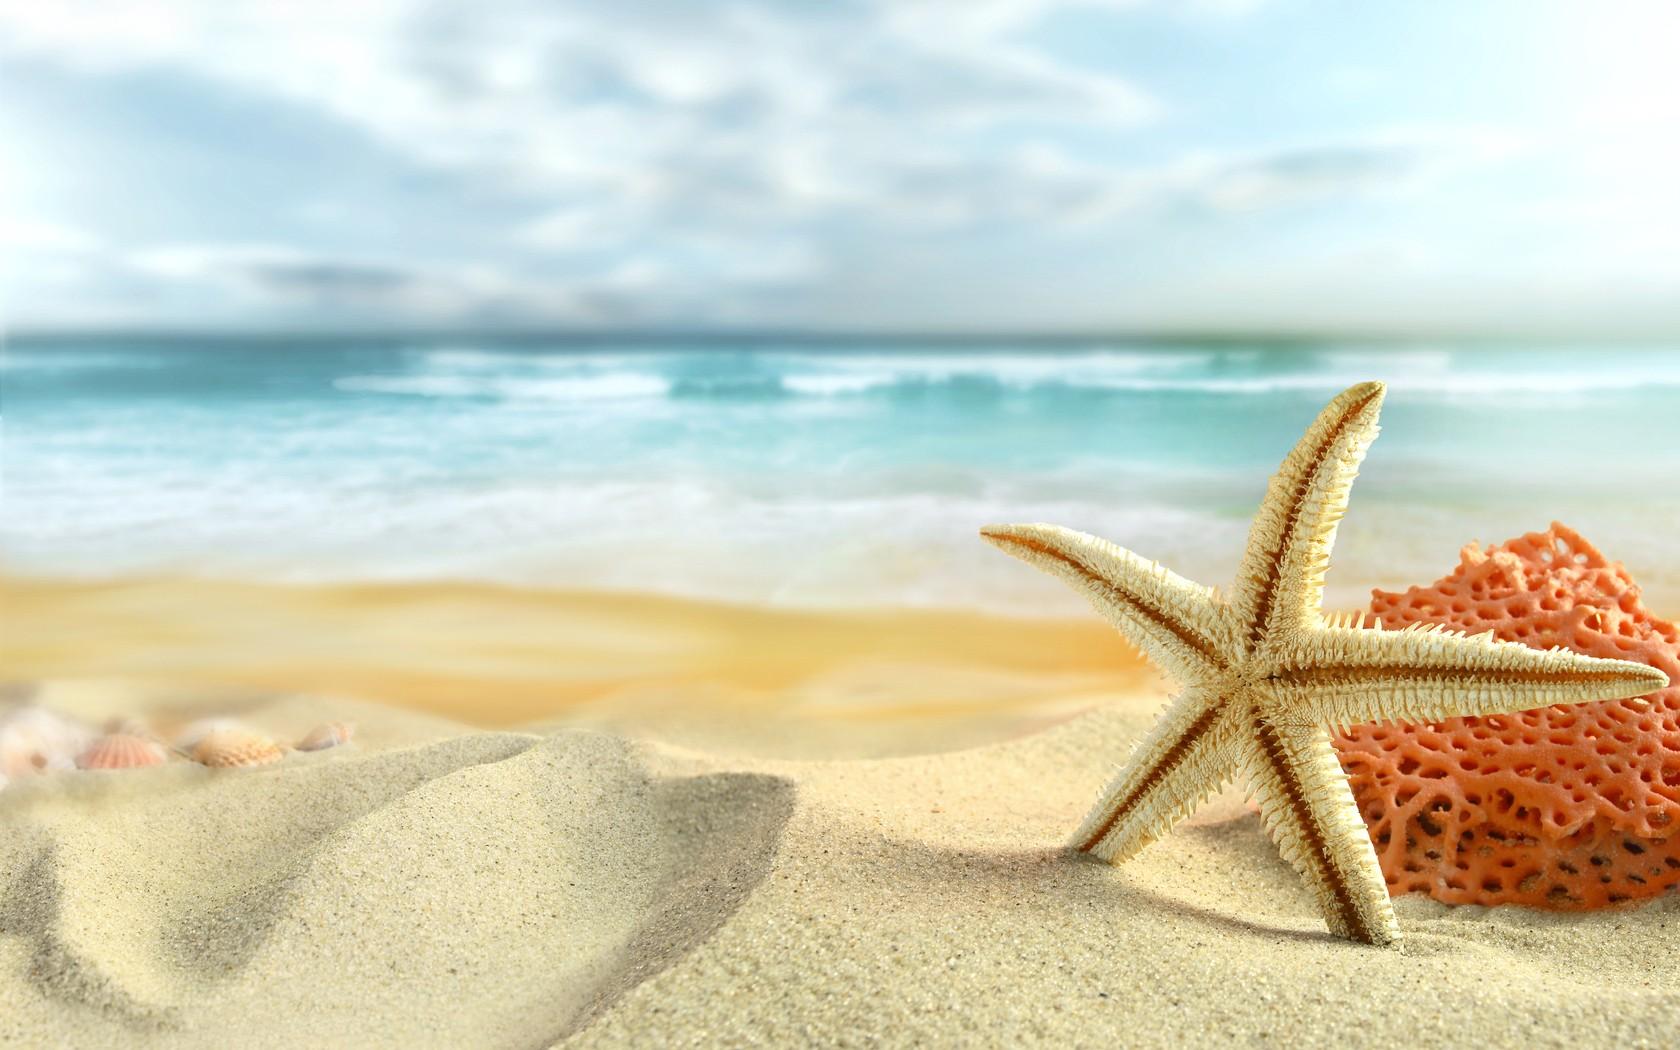 Ocean sand stars starfish sea beaches wallpaper | 1680x1050 | 184243 ...: www.wallpaperup.com/184243/ocean_sand_stars_starfish_sea_beaches.html